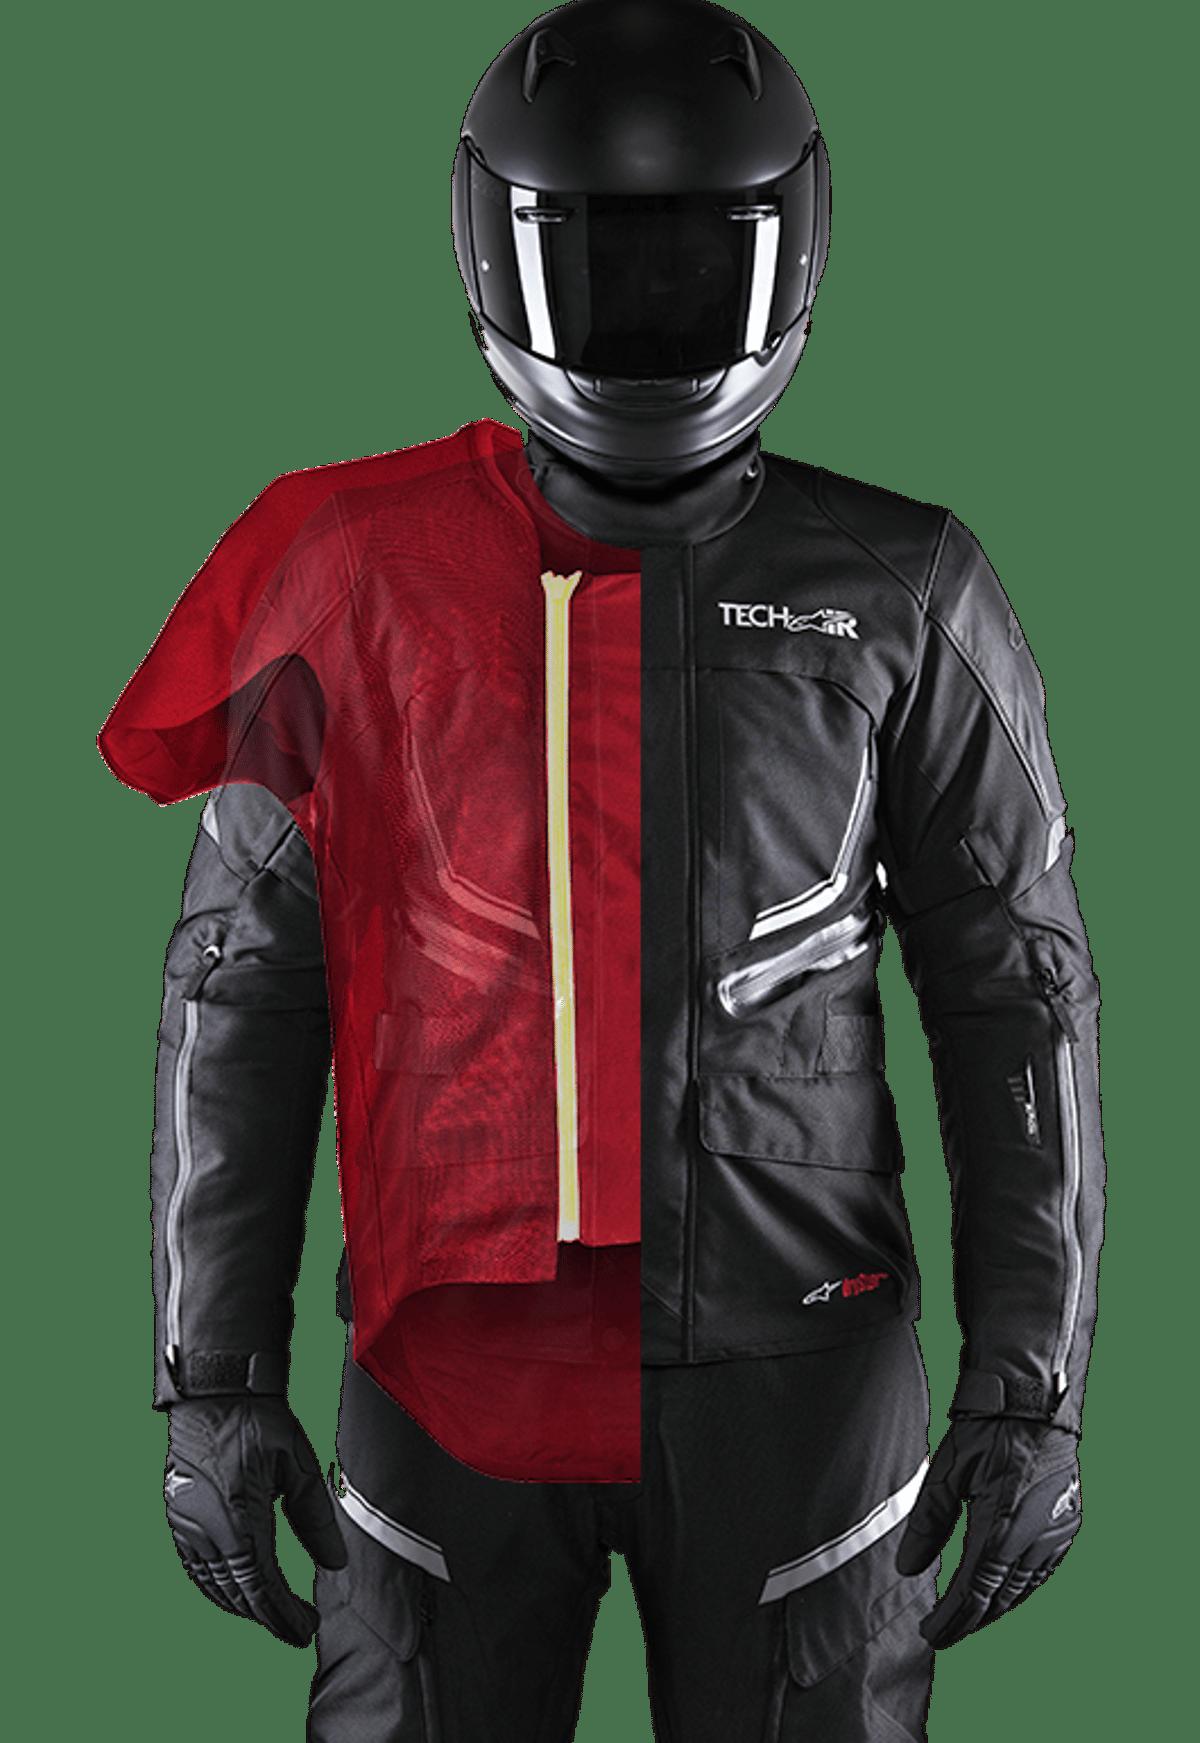 Alpinestars Tech-Air street airbag system will equip a new line of BMW Motorrad jackets